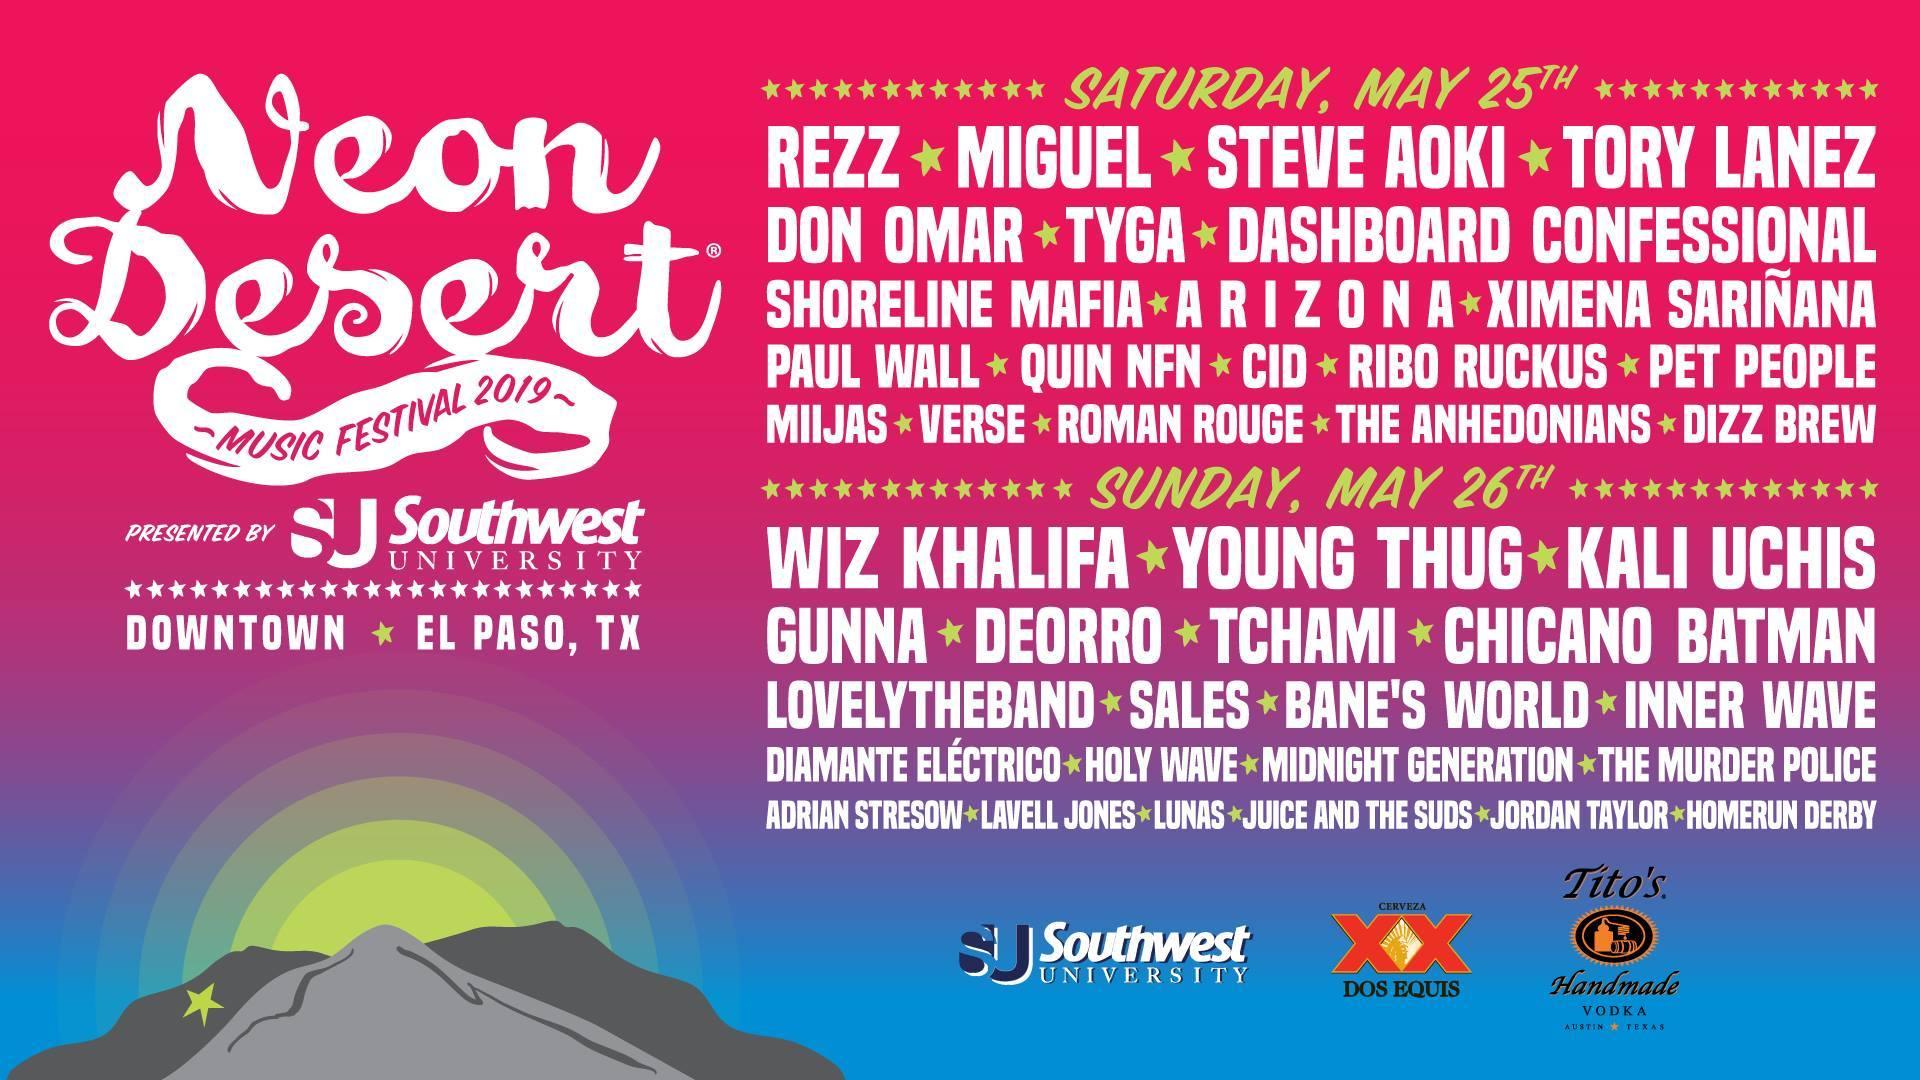 Neon Desert Music Festival - El Paso, Texas 2019 Lineup